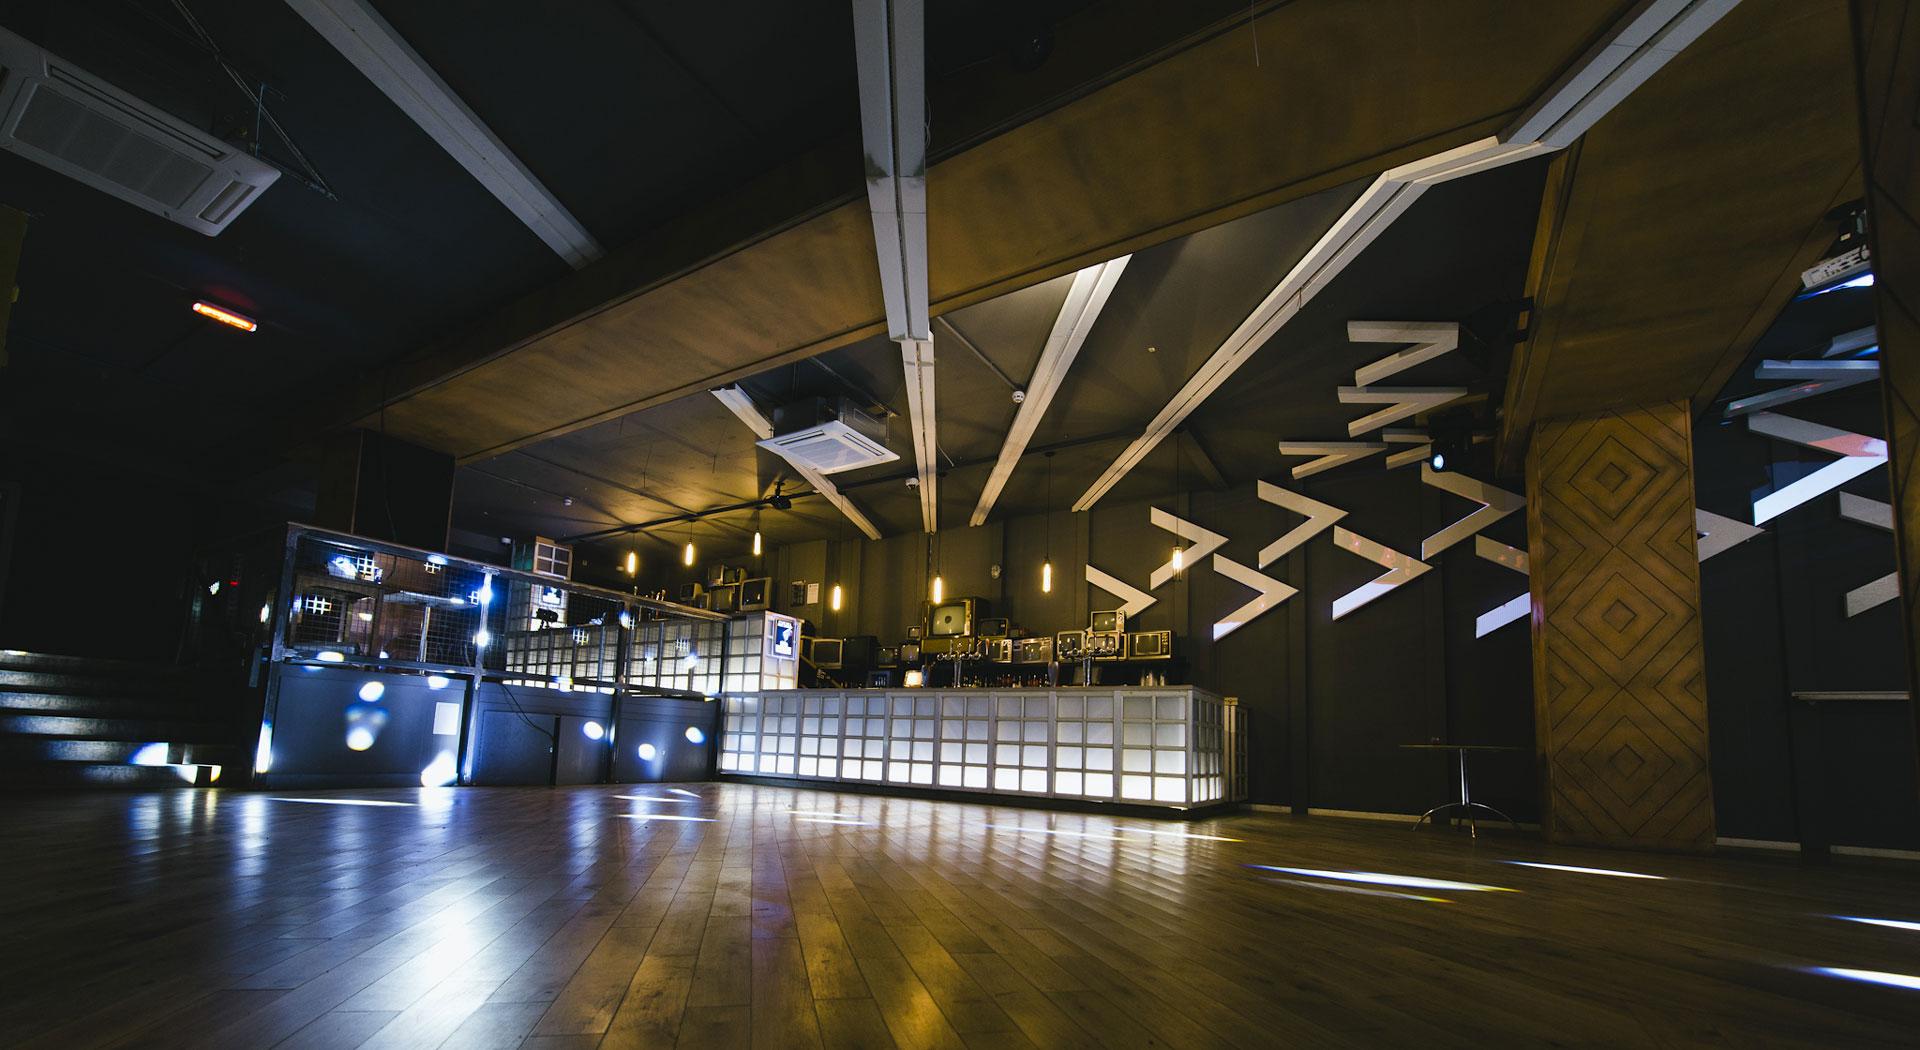 La Belle Angele Edinburgh - Edinburgh's premier club and live music venue